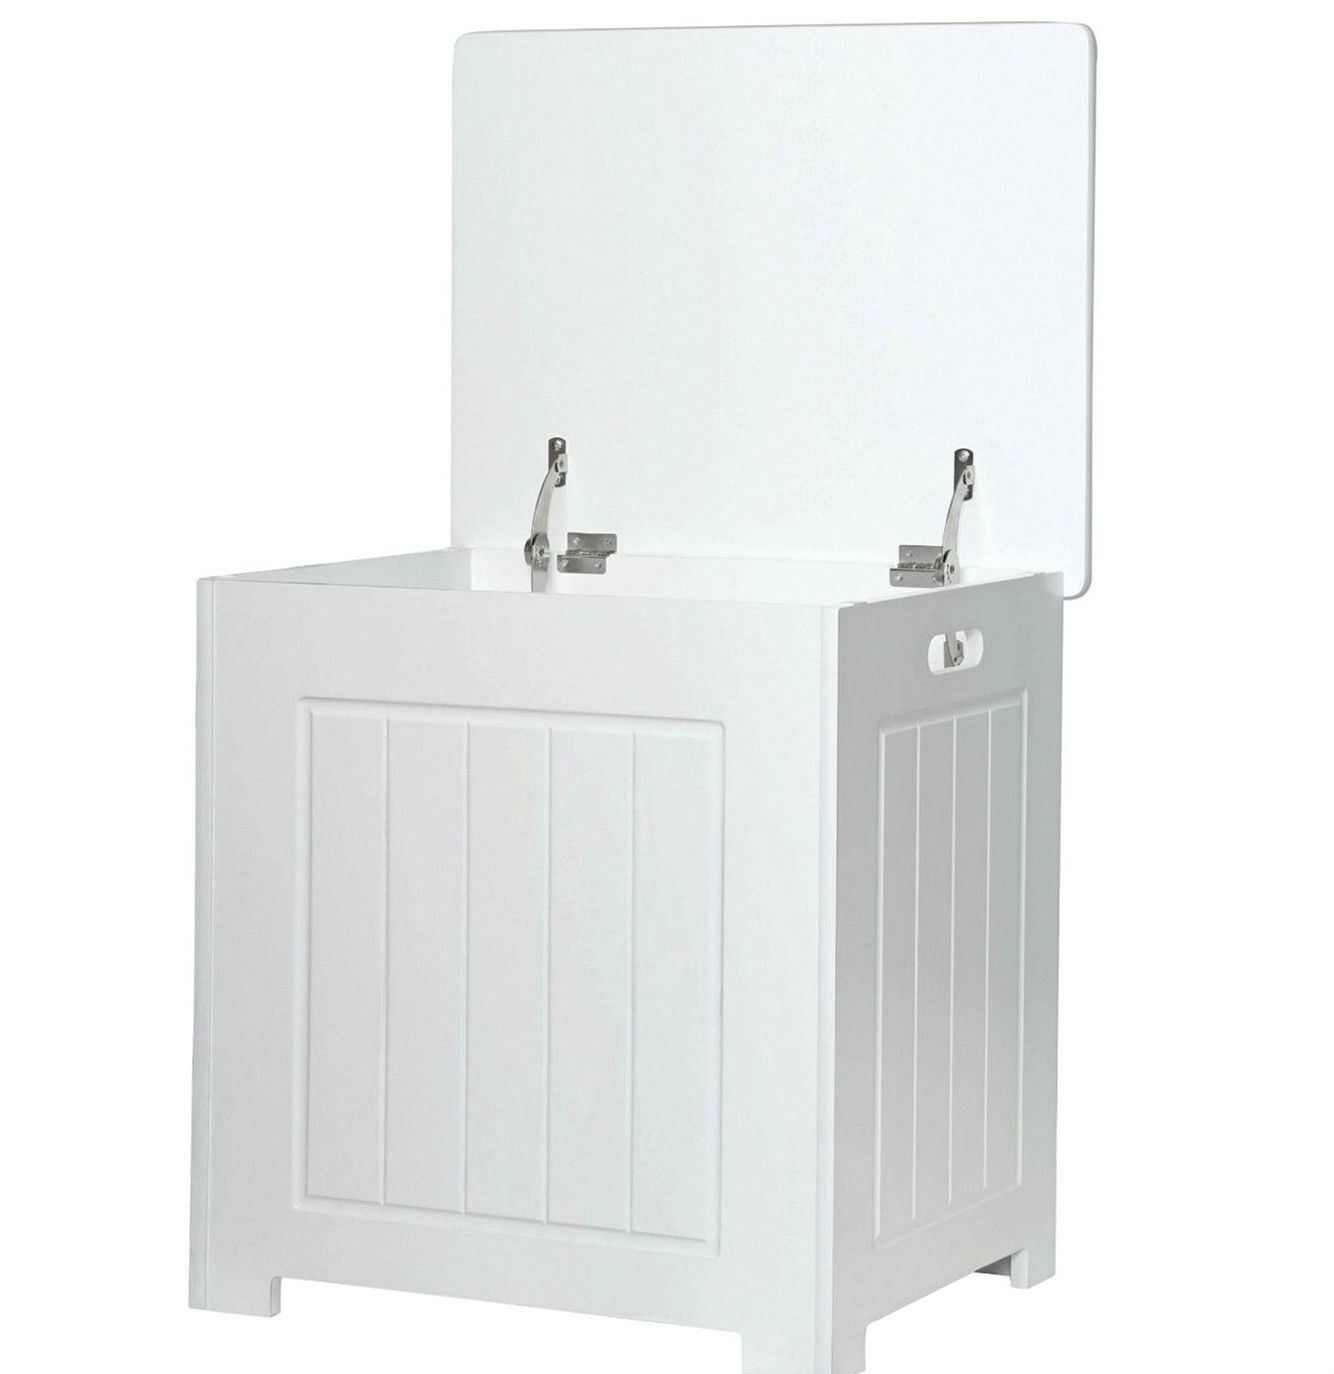 New-White-Wooden-Bathroom-Cabinet-Shelf-Furniture-Cupboard-Bedroom-Storage-Unit miniatuur 14